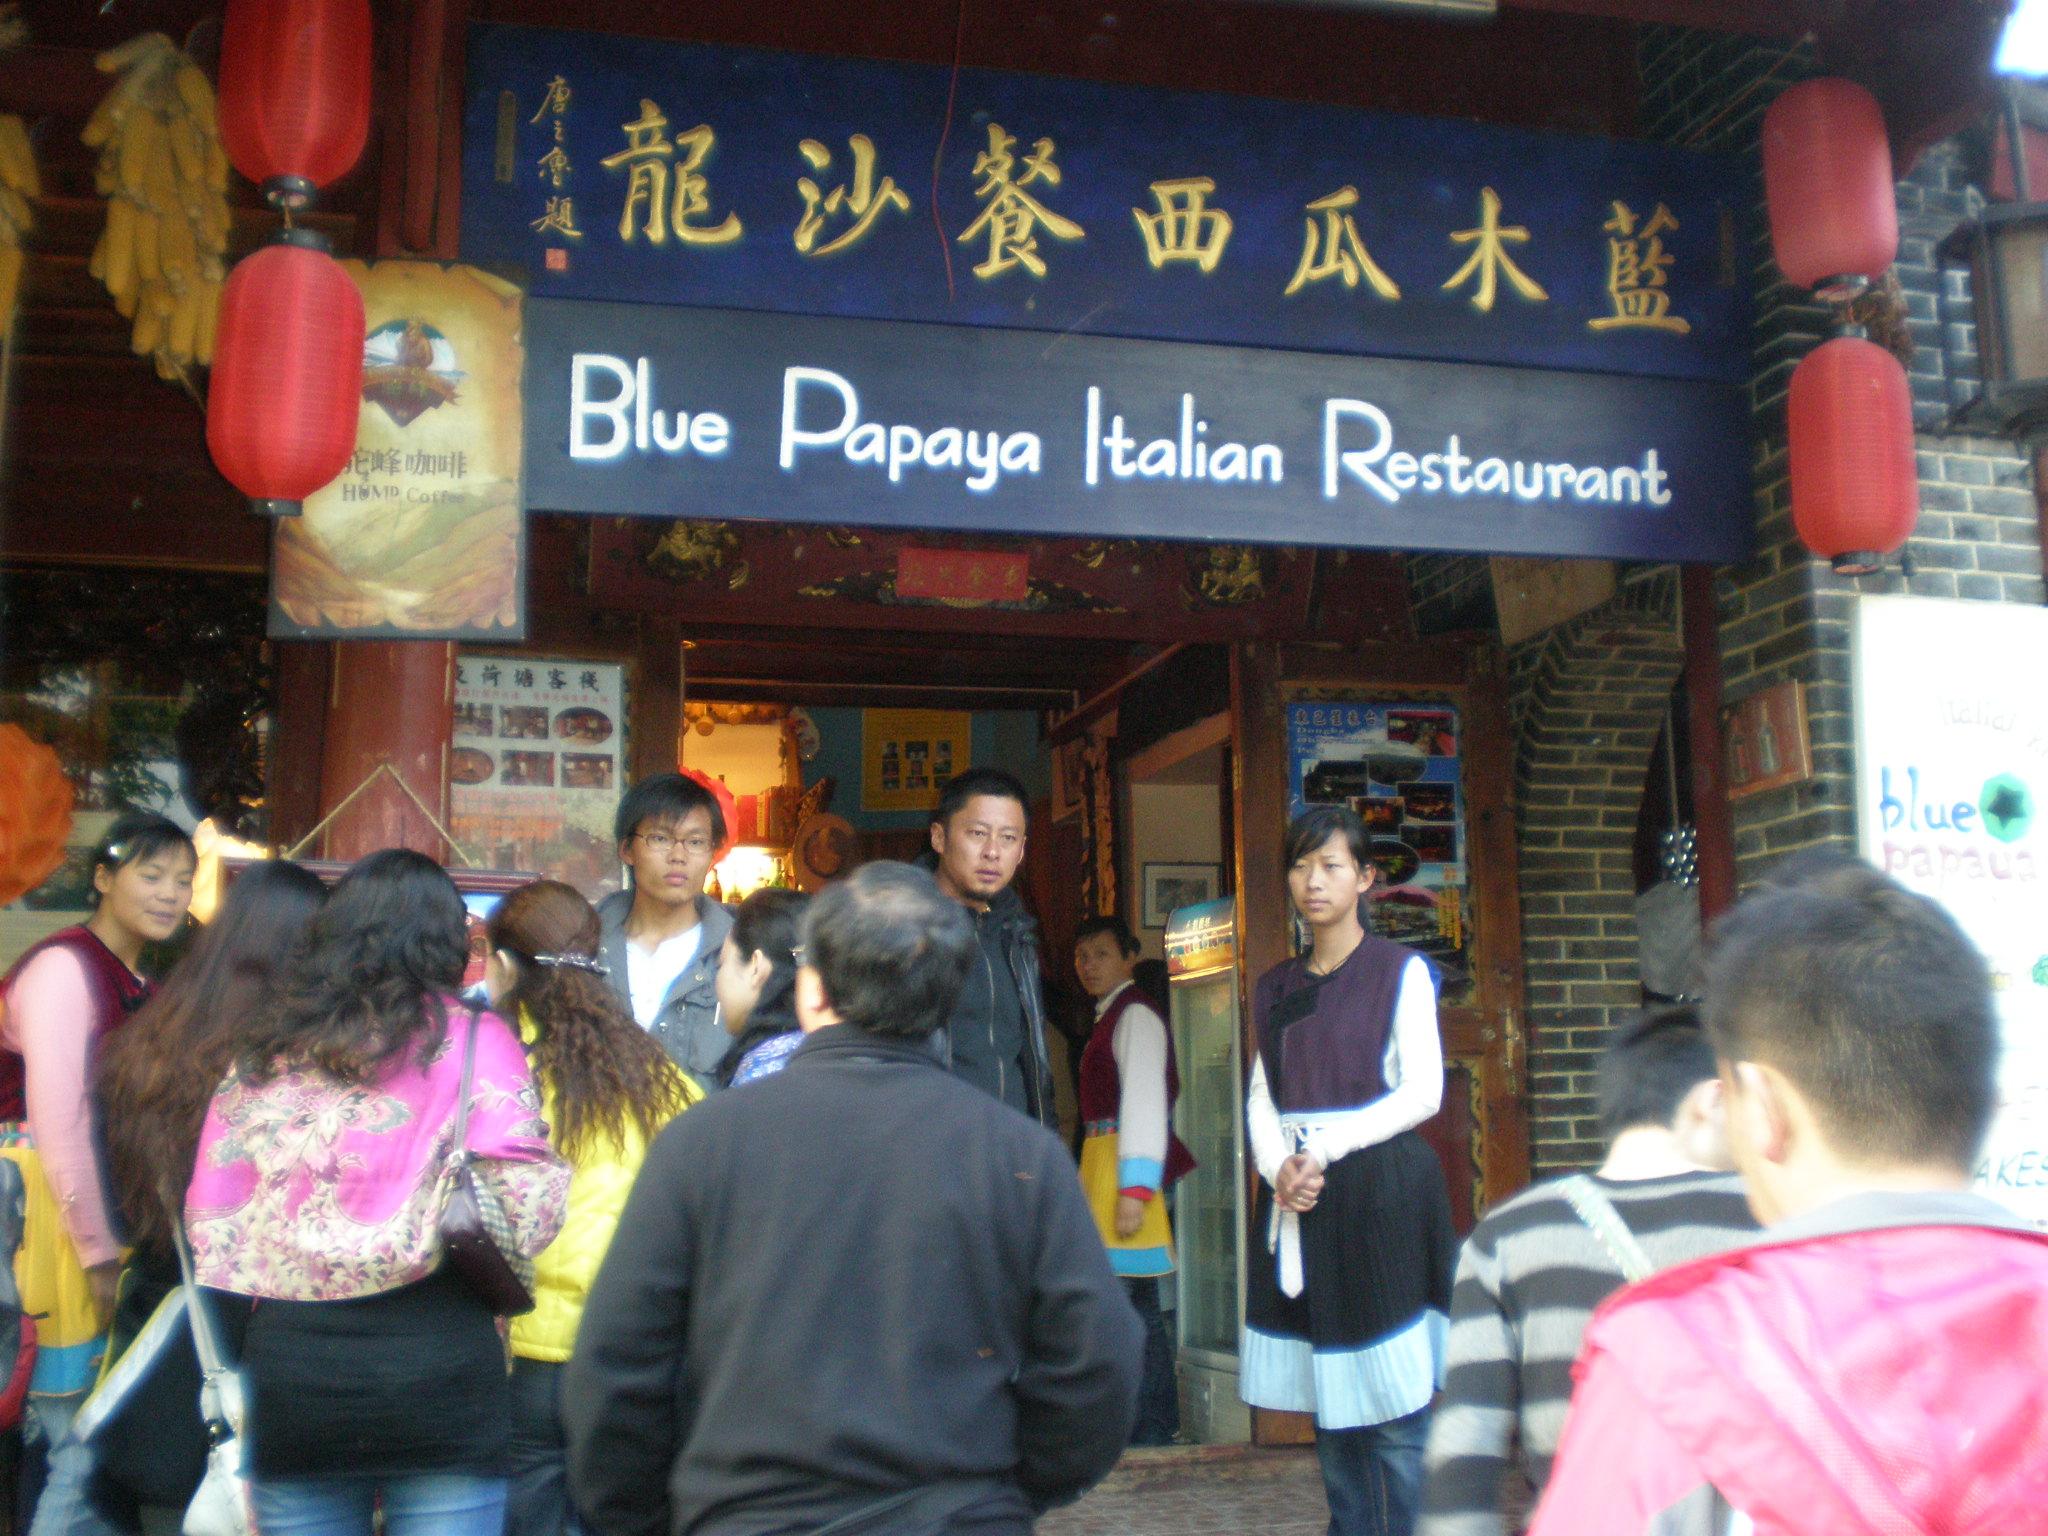 Fileblue Papaya Italian Restaurant Old Town Of Lijiangjpg